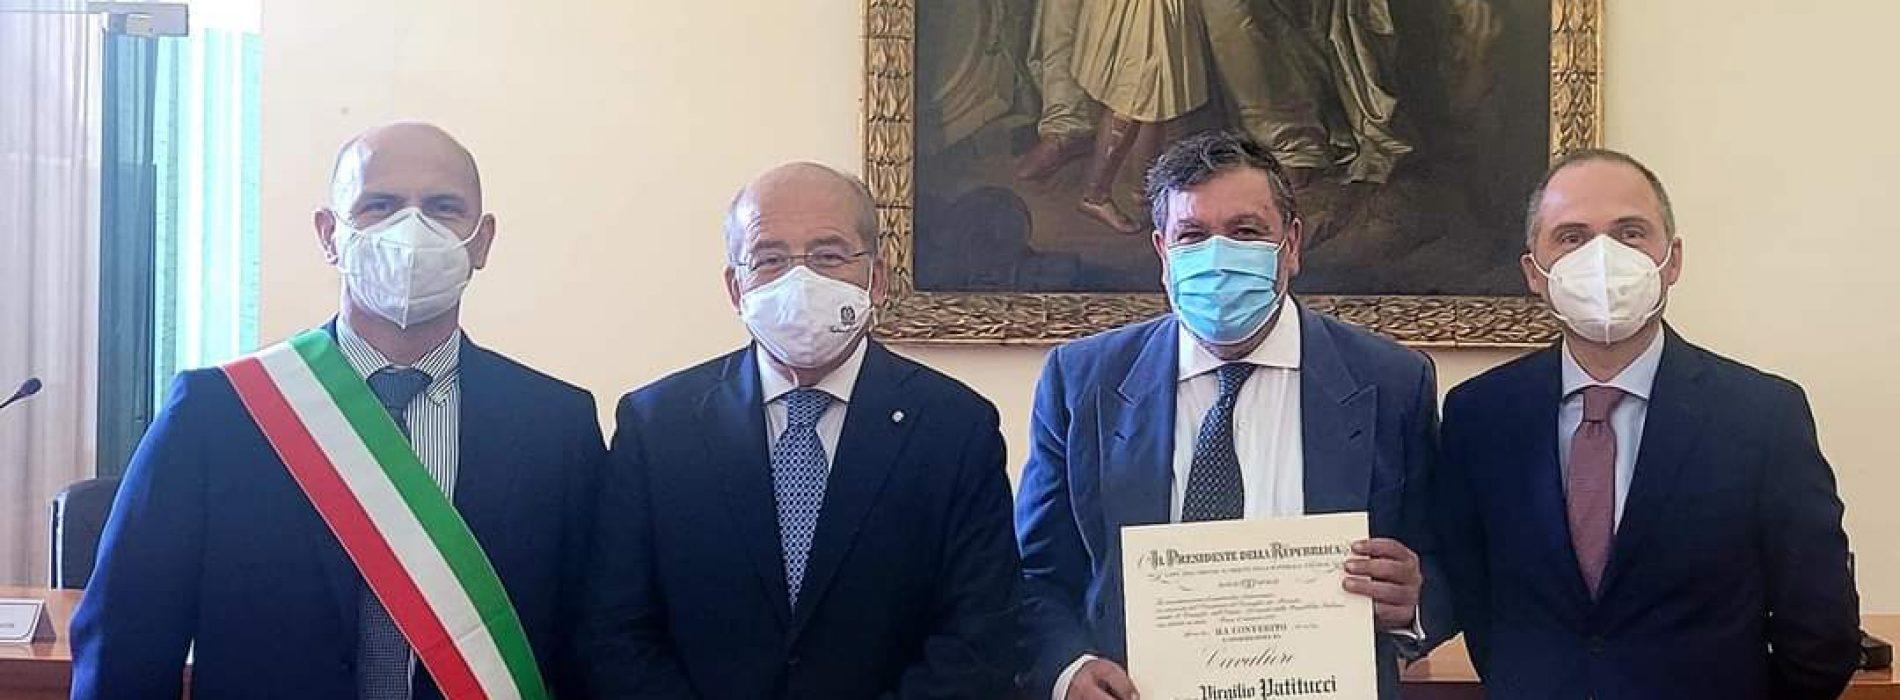 Onorificenze all'ospedale di  Caserta, tre i dipendenti premiati